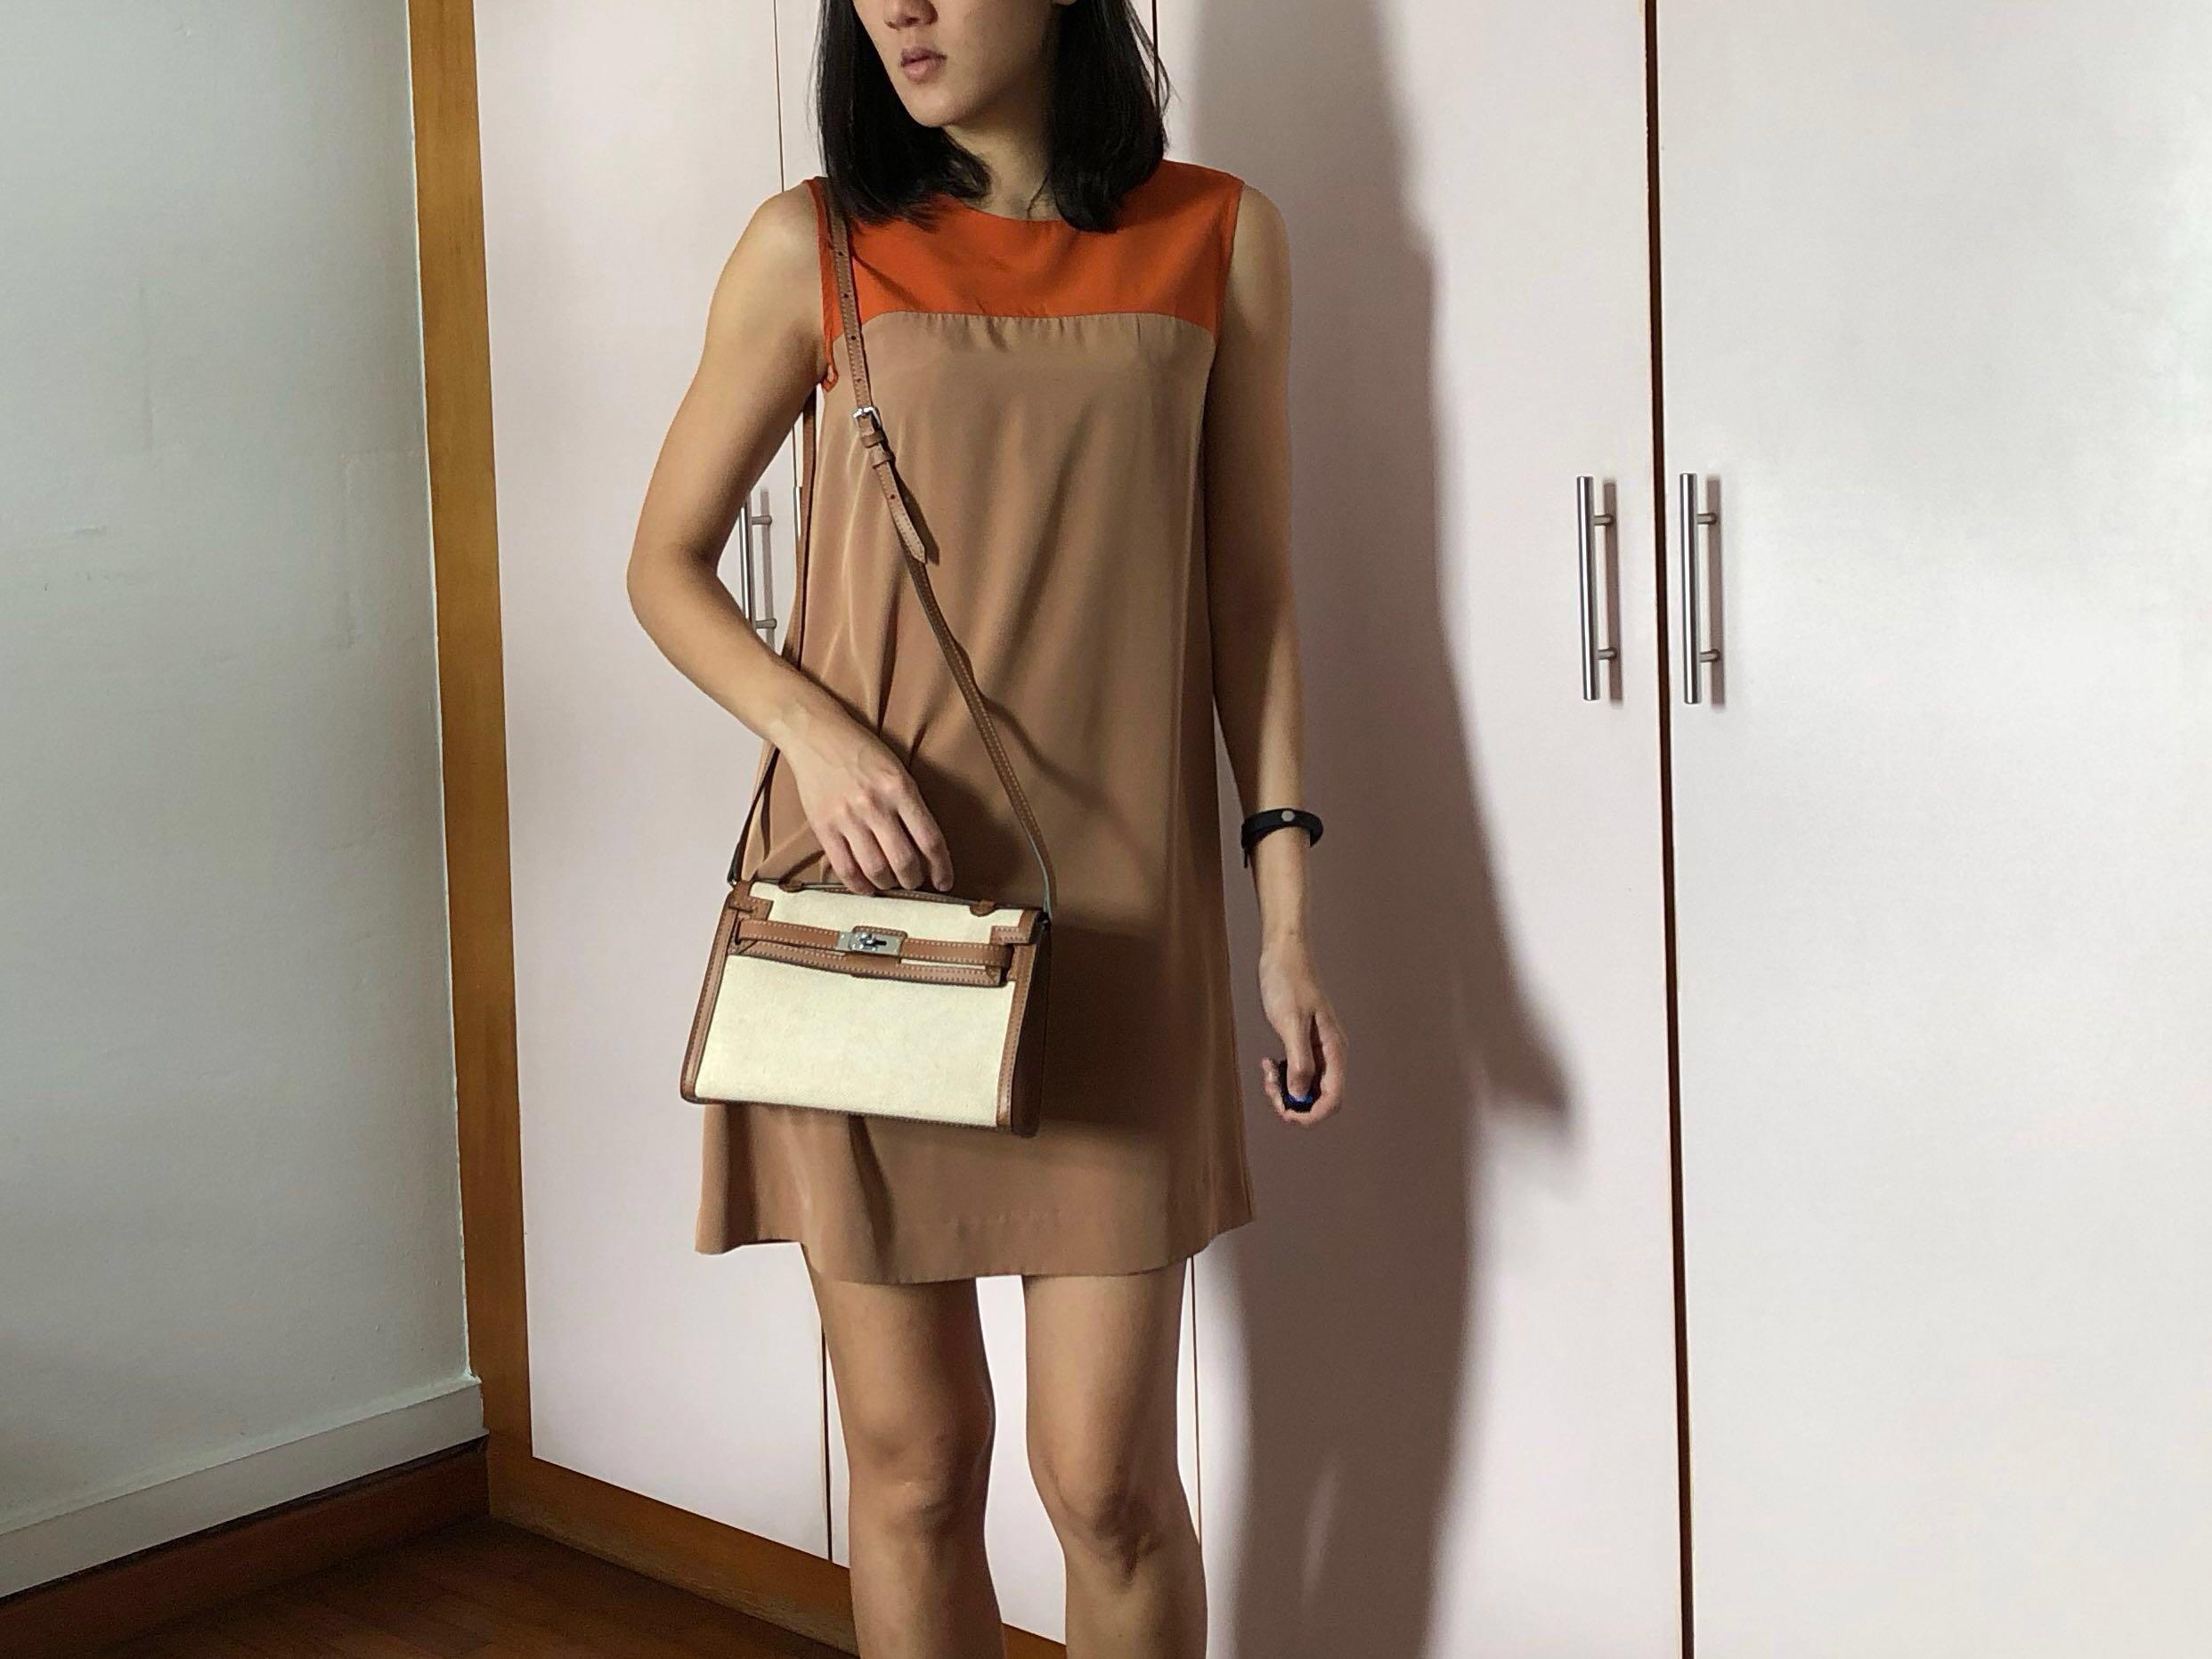 d5c4dfbedfa61 G2000 Zara H&M Silk Dress duo tone size 32, Women's Fashion, Clothes ...